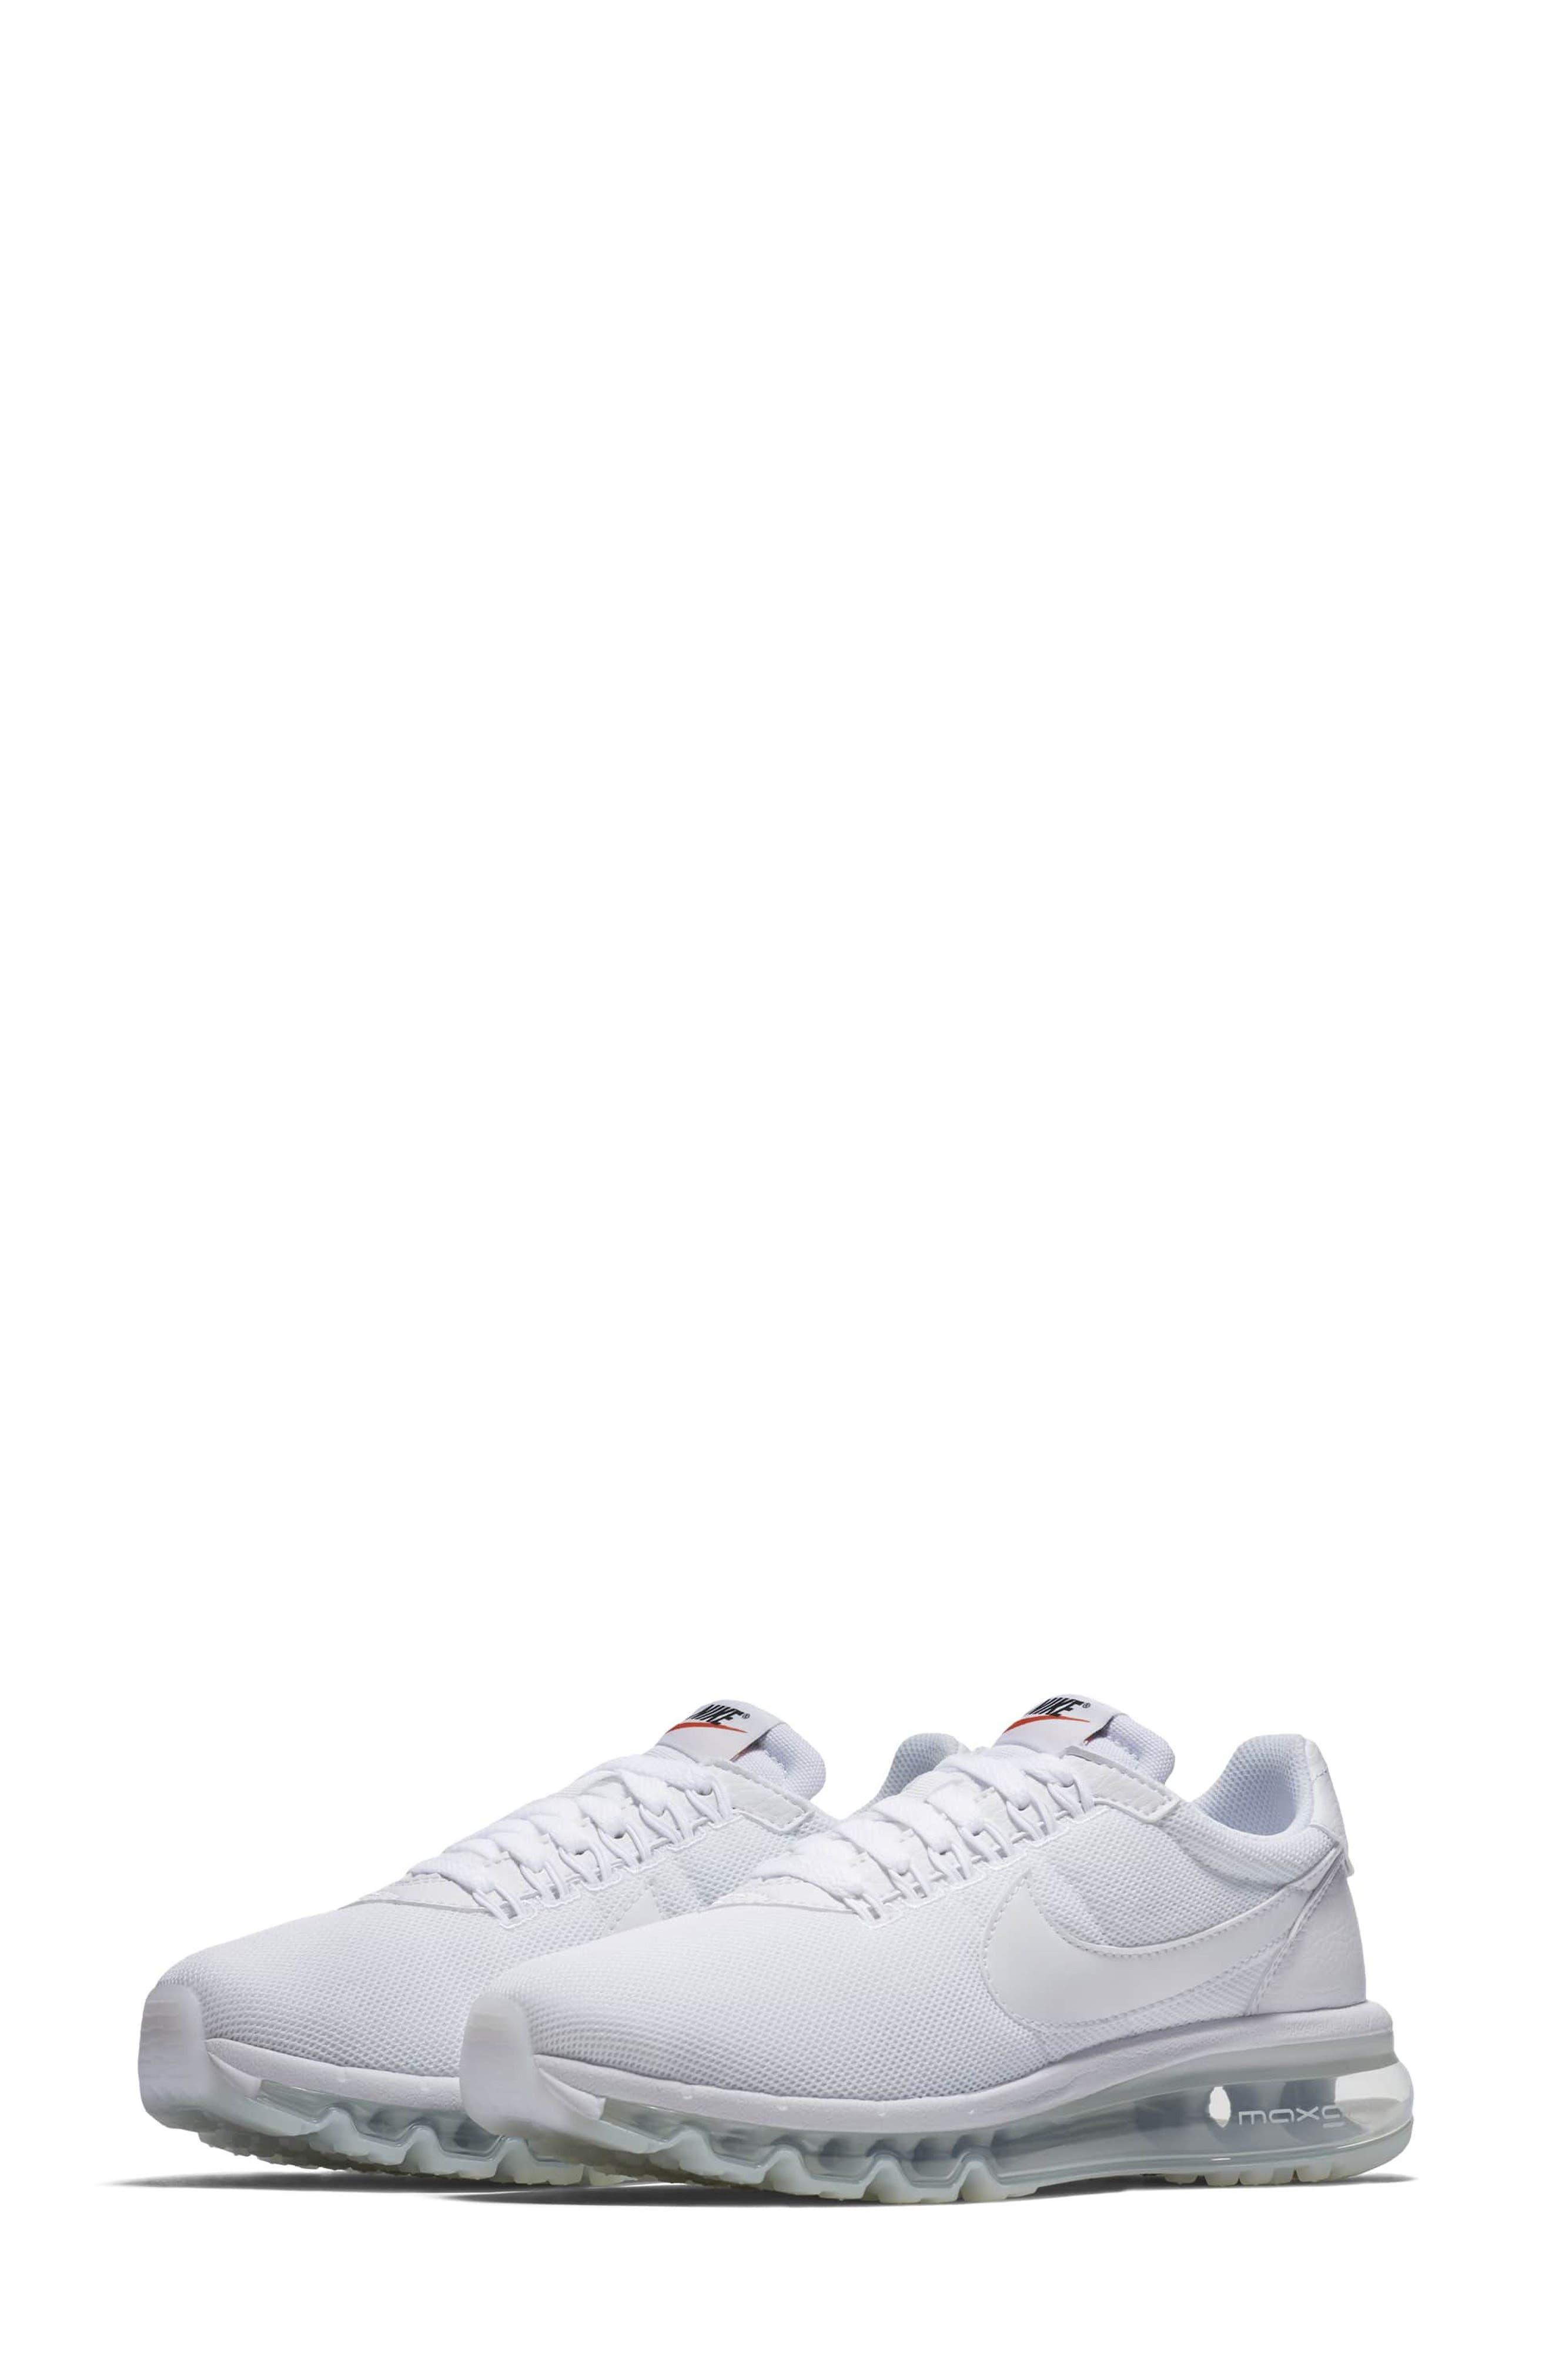 Main Image - Nike Air Max LD-Zero Sneaker (Women)